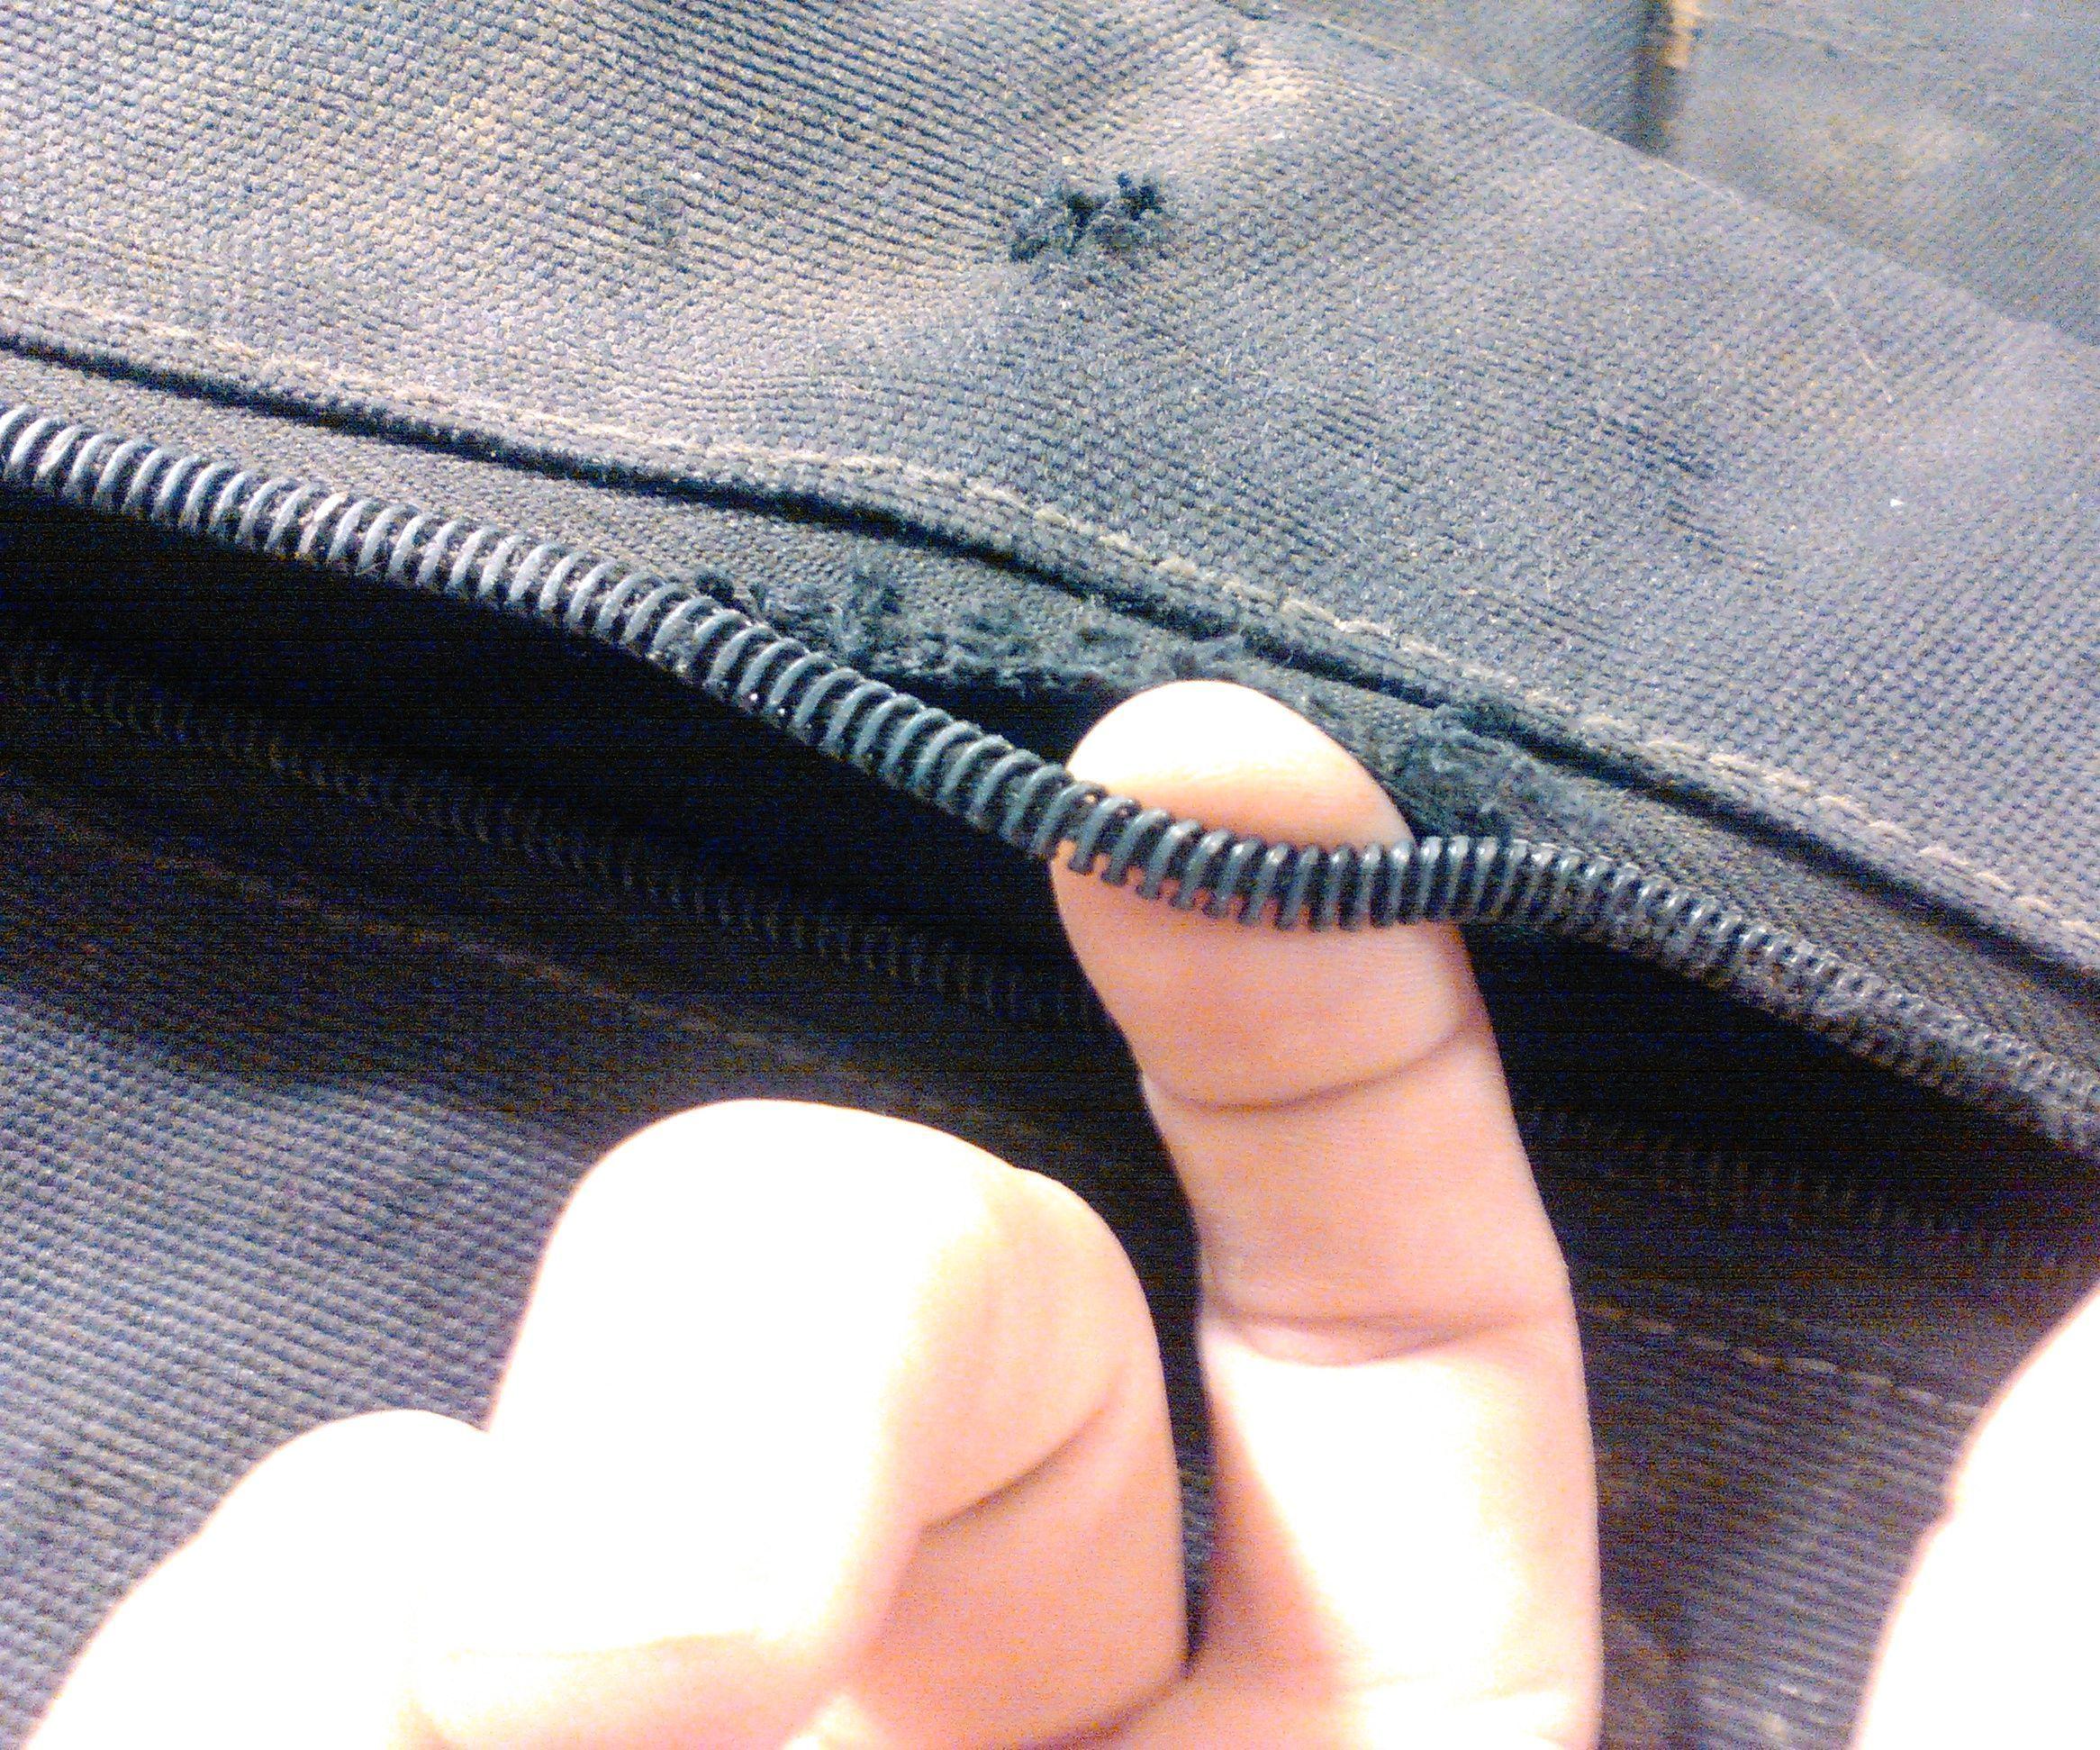 How to fix separated nylon zipper teeth